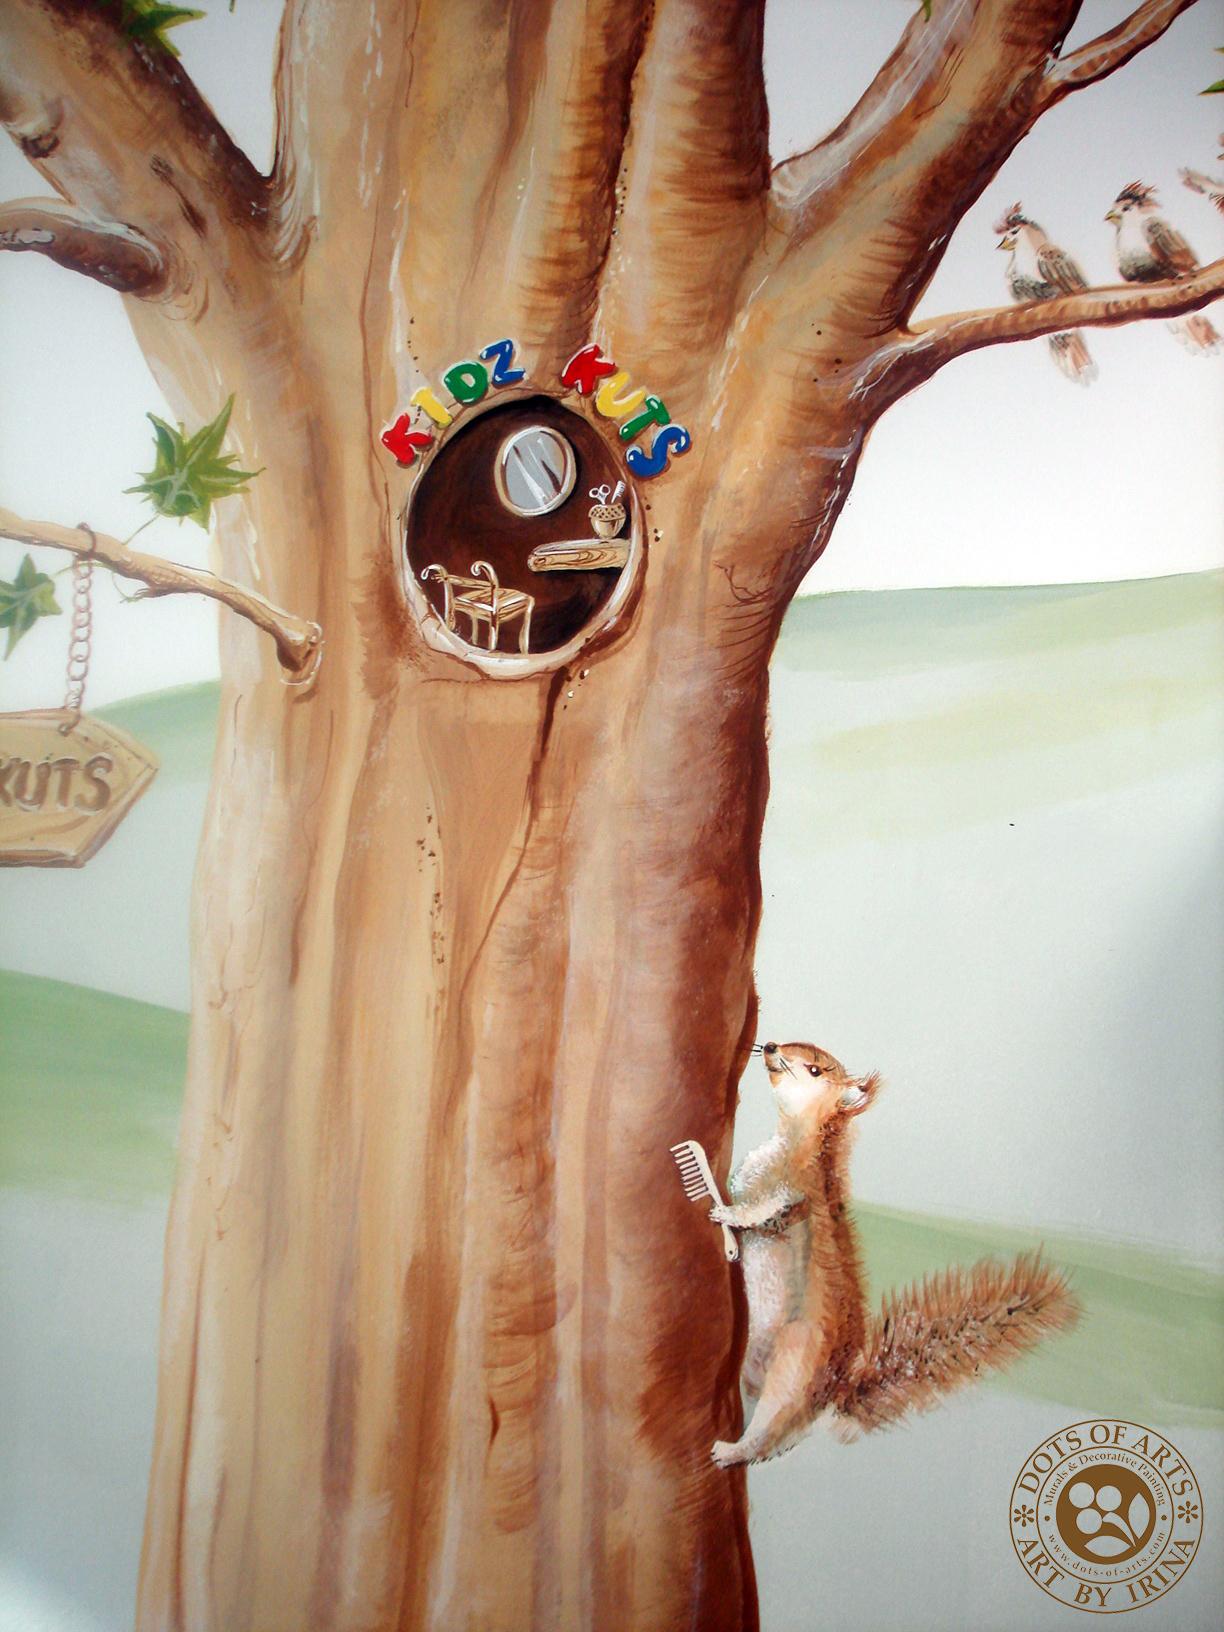 mural-custom-wall-commercial-kidz-kuts-woodbridge-nj-dots-of-arts.jpg